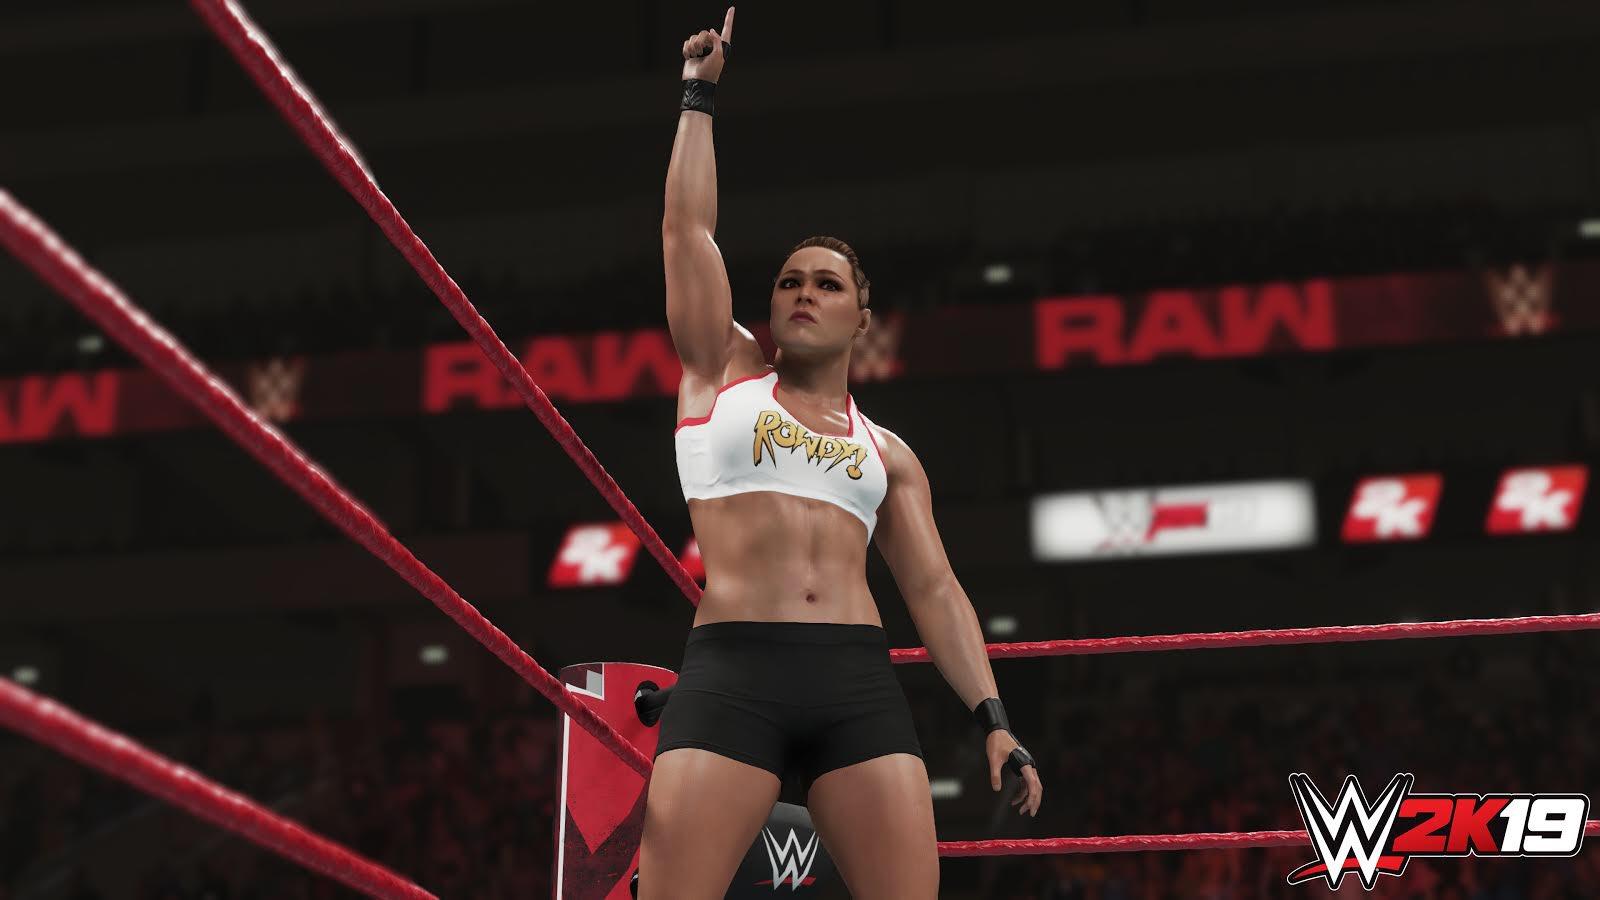 WWE 2K19 : 2K DÉVOILE UN SCREEN DE RONDA ROUSEY DlEWVVoWwAAZnab